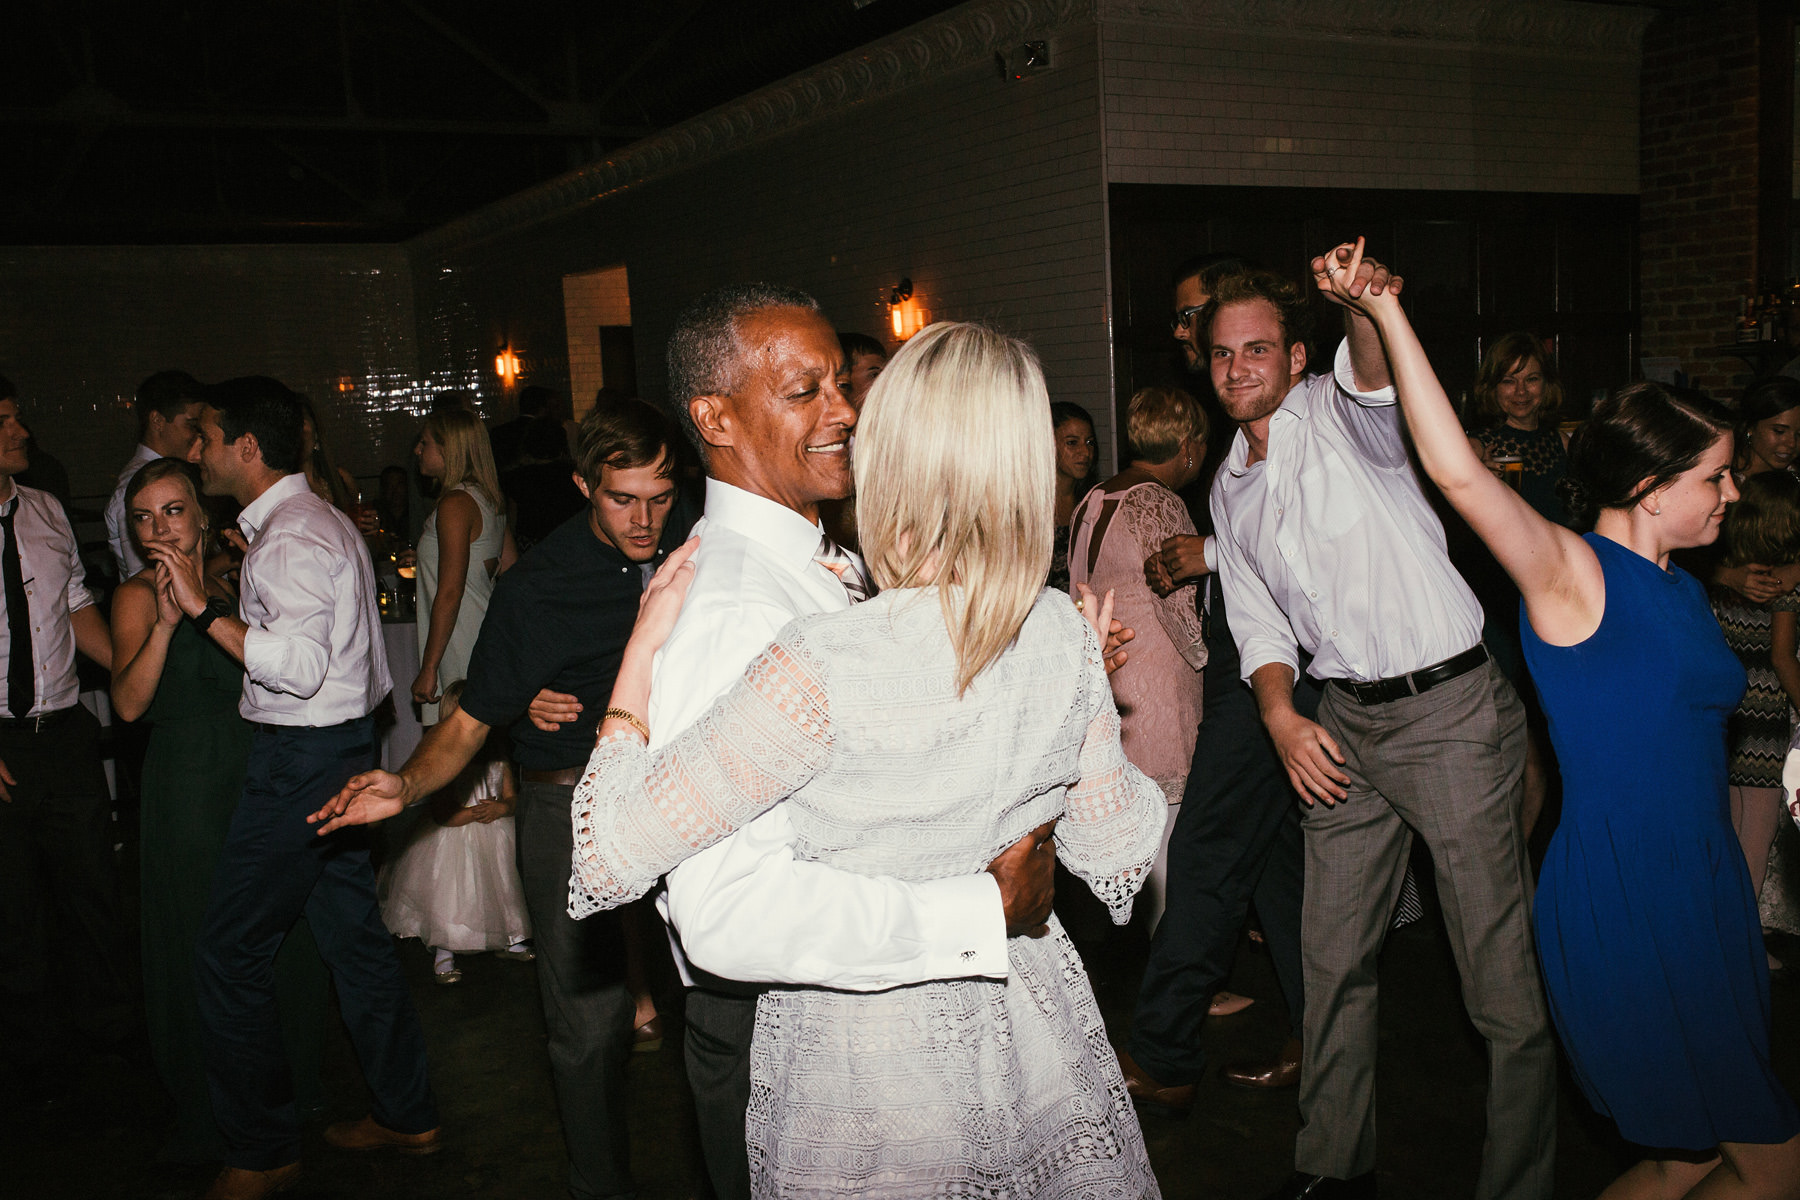 Kansas City Summer Wedding at the Guild_Kindling Wedding Photography Blog85.JPG